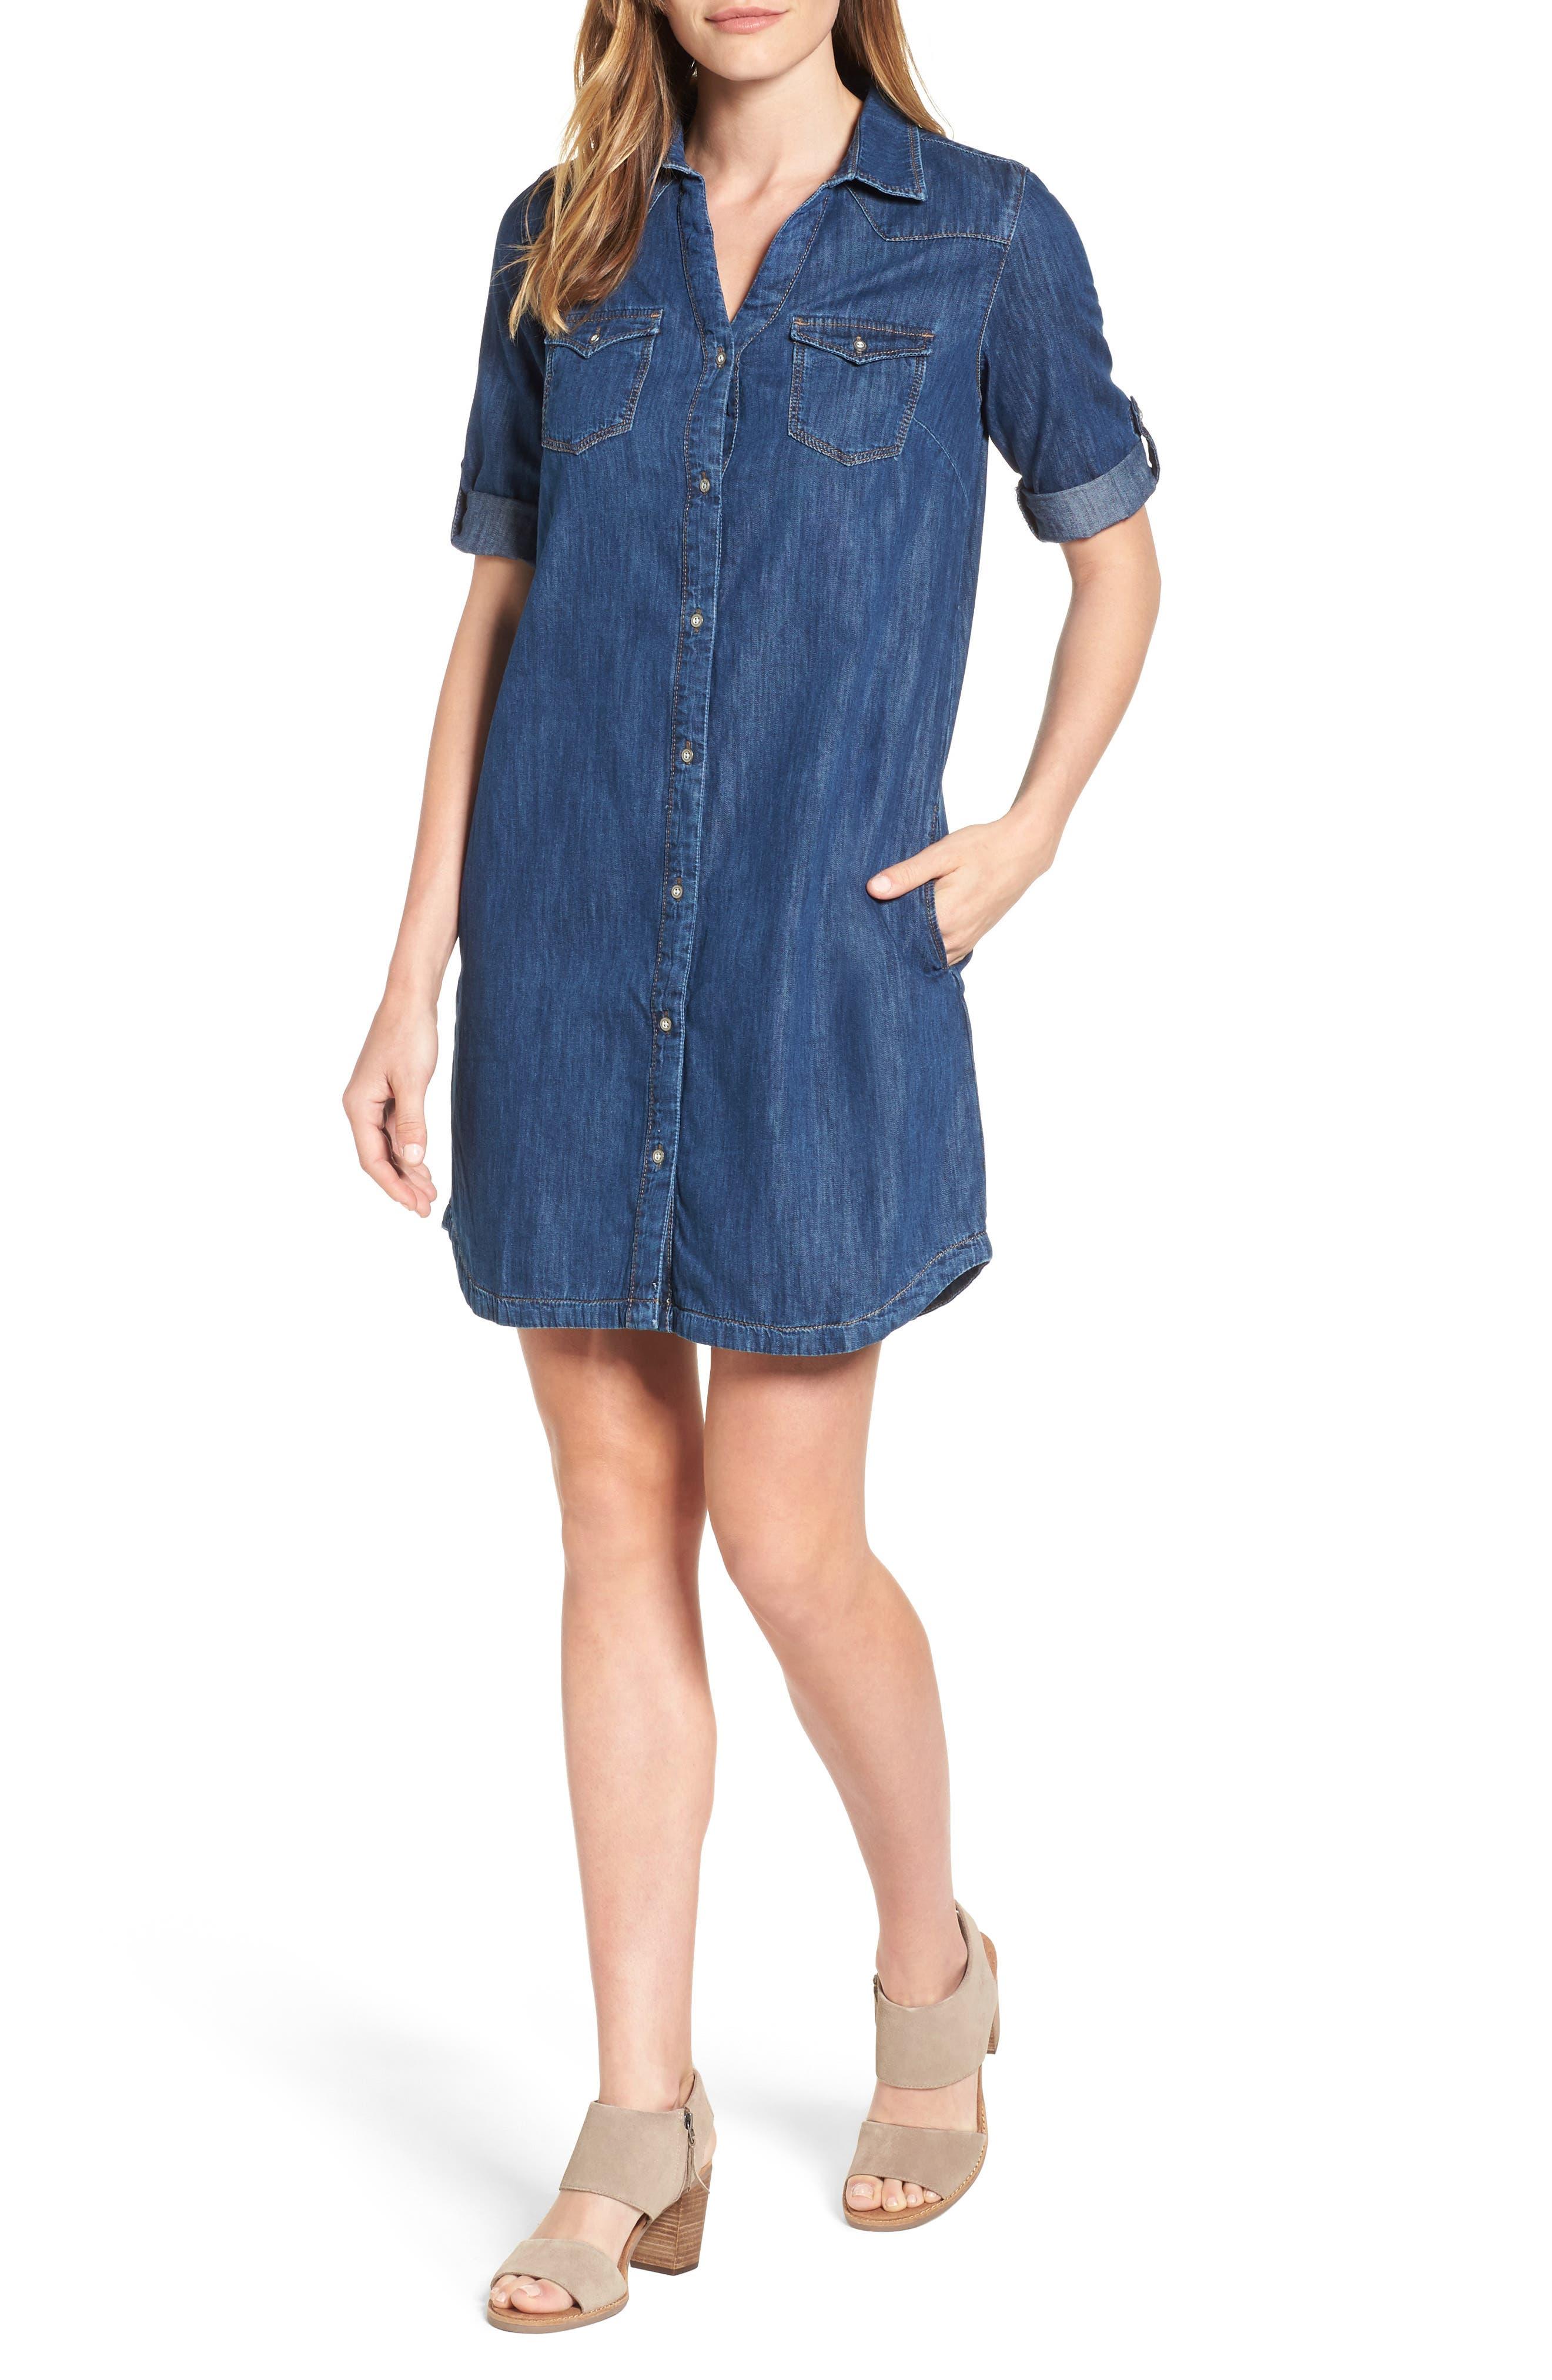 Alternate Image 1 Selected - Mavi Jeans Bree Denim Shirtdress